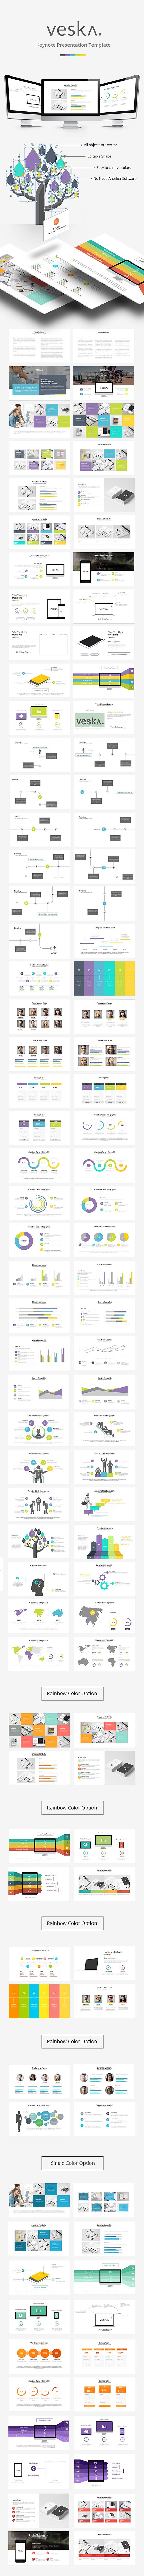 Veska Keynote Presentation - Business Keynote Templates